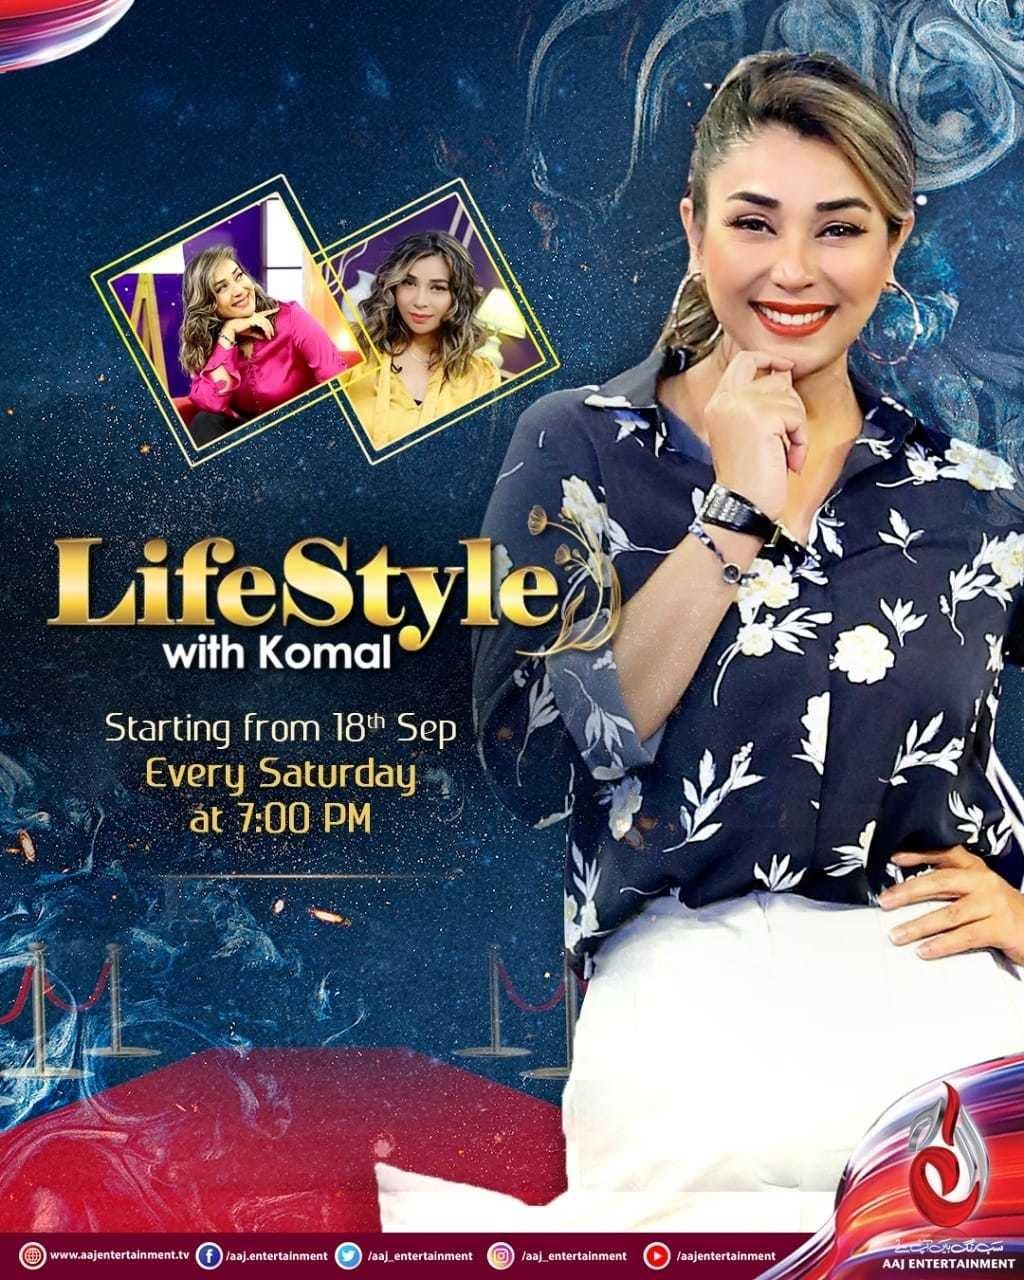 Komal Rizvi's show will air on Aaj Entertainment on Saturday at 7pm.